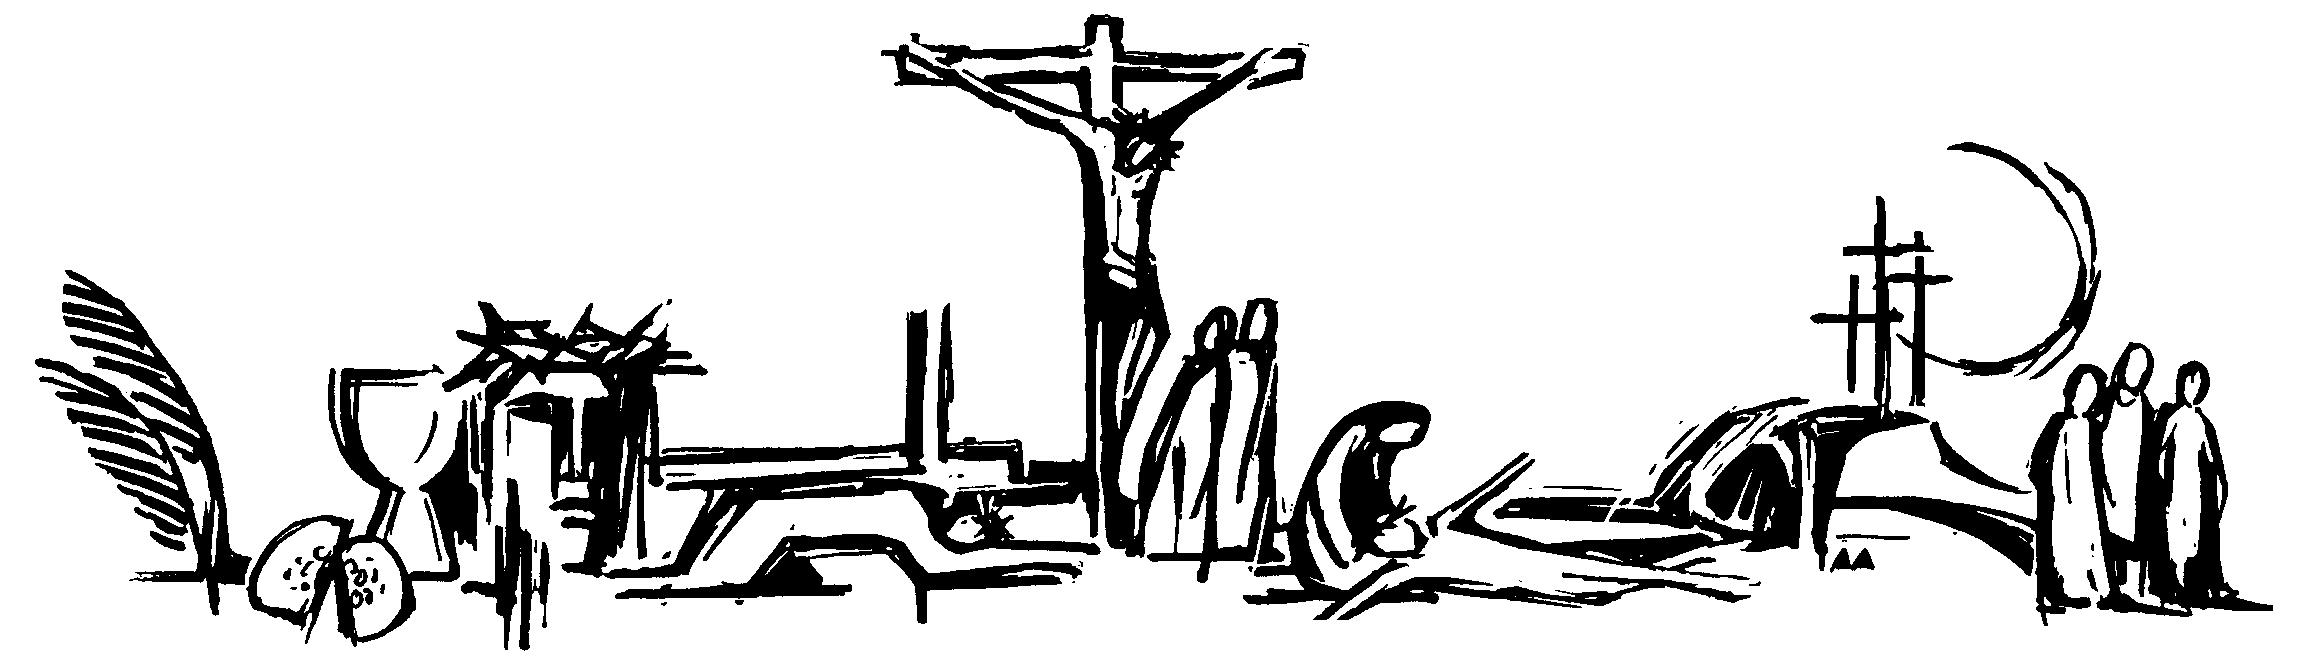 Catholic lenten clipart jpg royalty free stock Free Catholic Lenten Clipart | CINEMAS 93 jpg royalty free stock